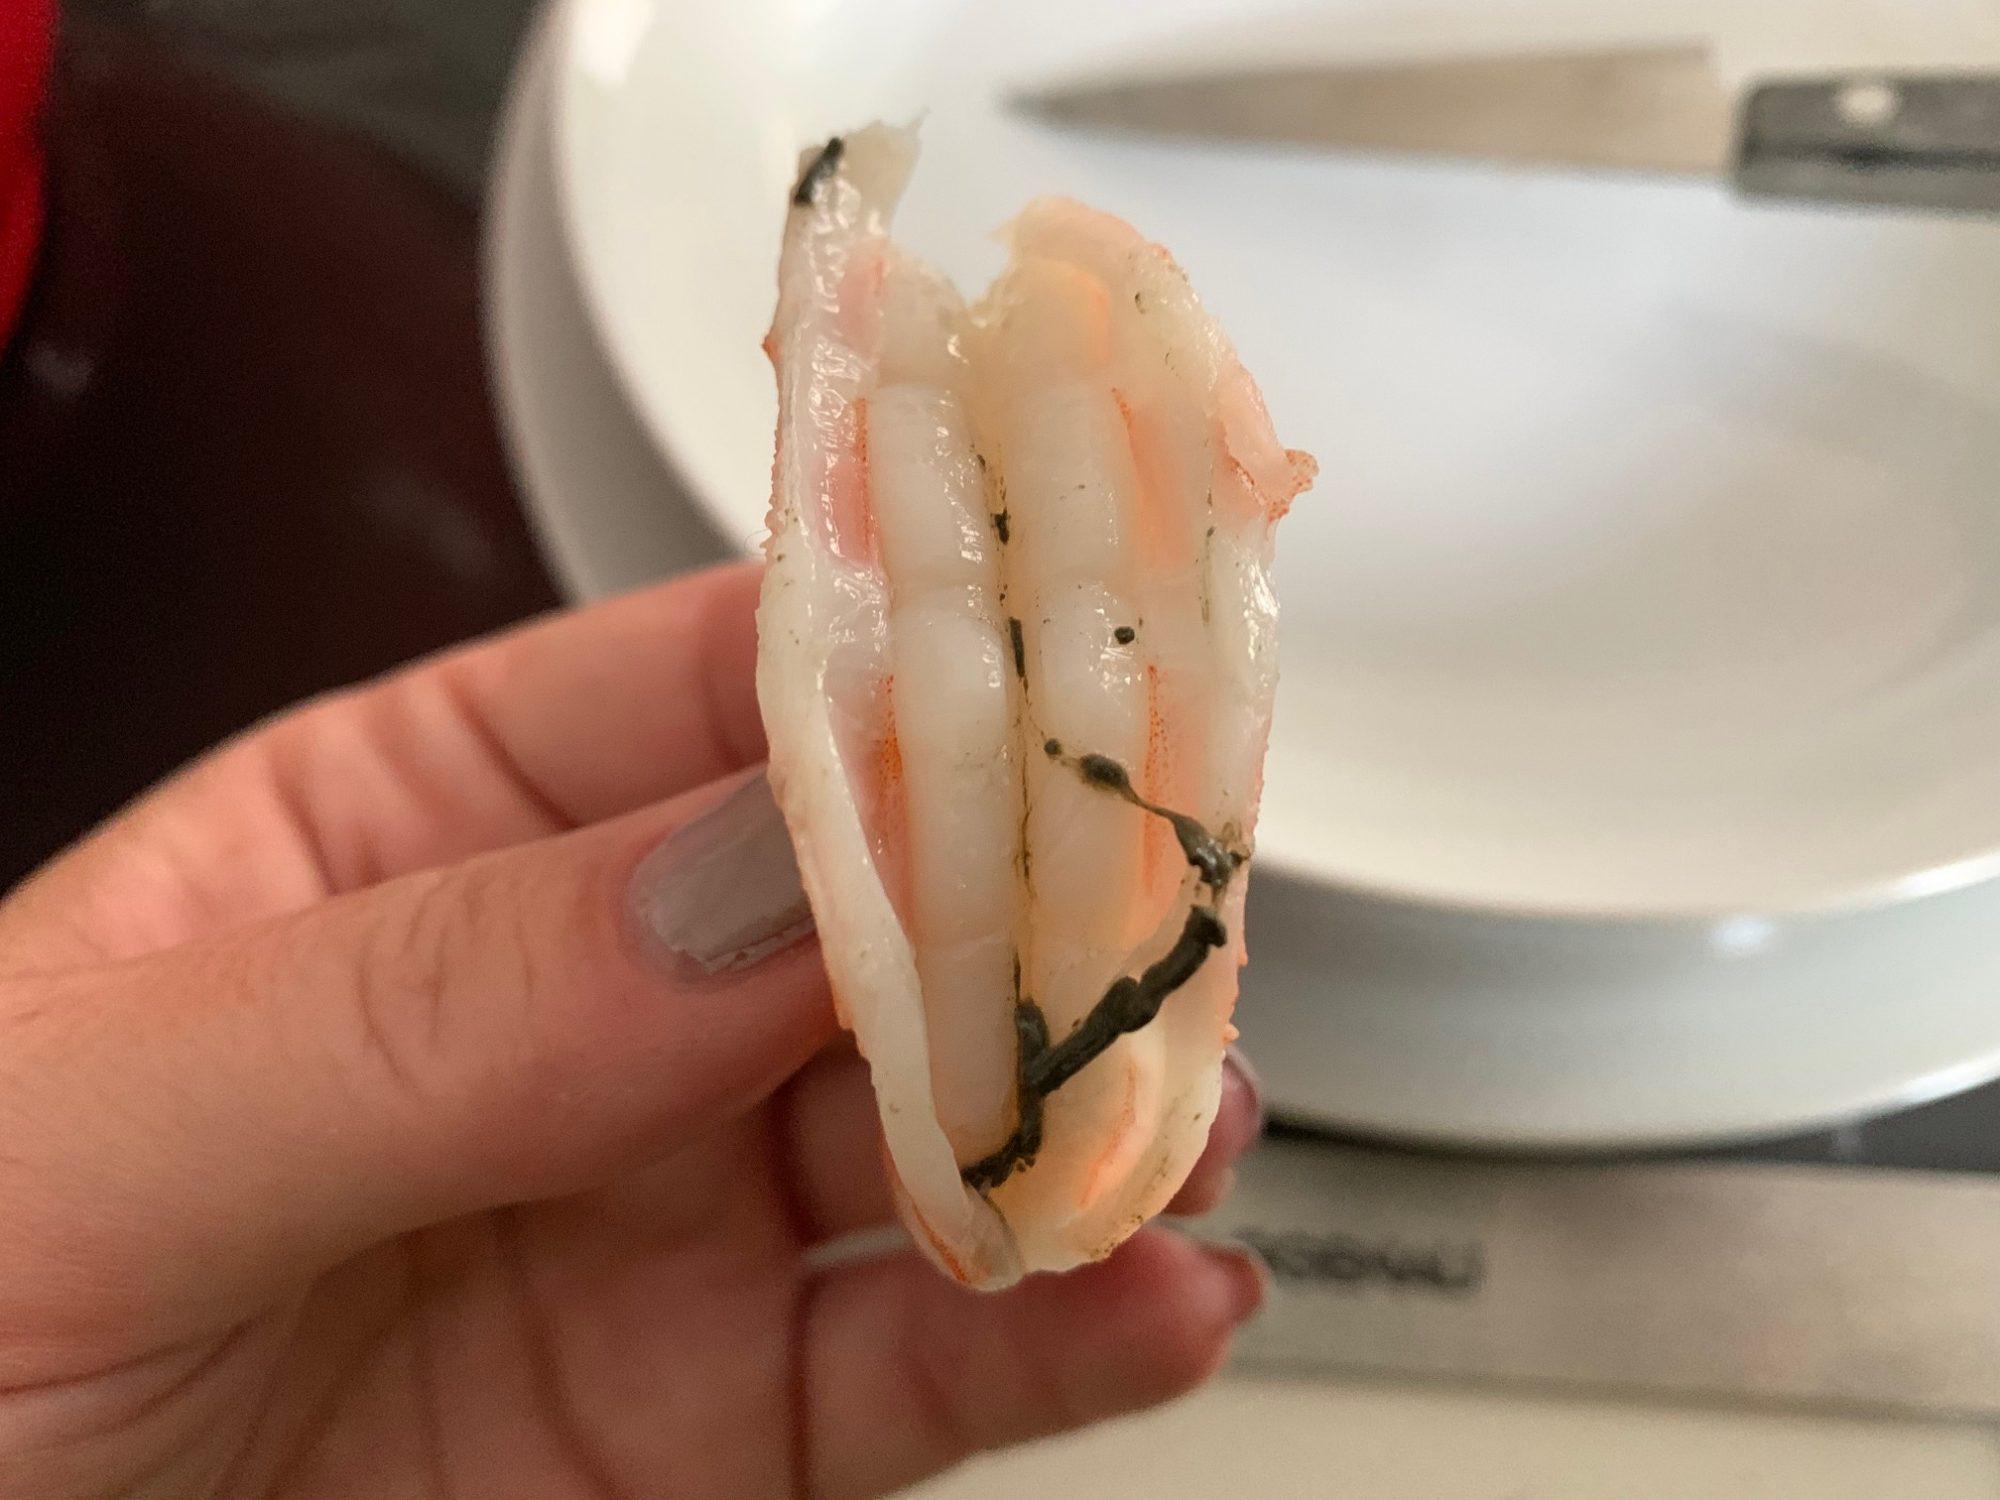 deveined cooked shrimp